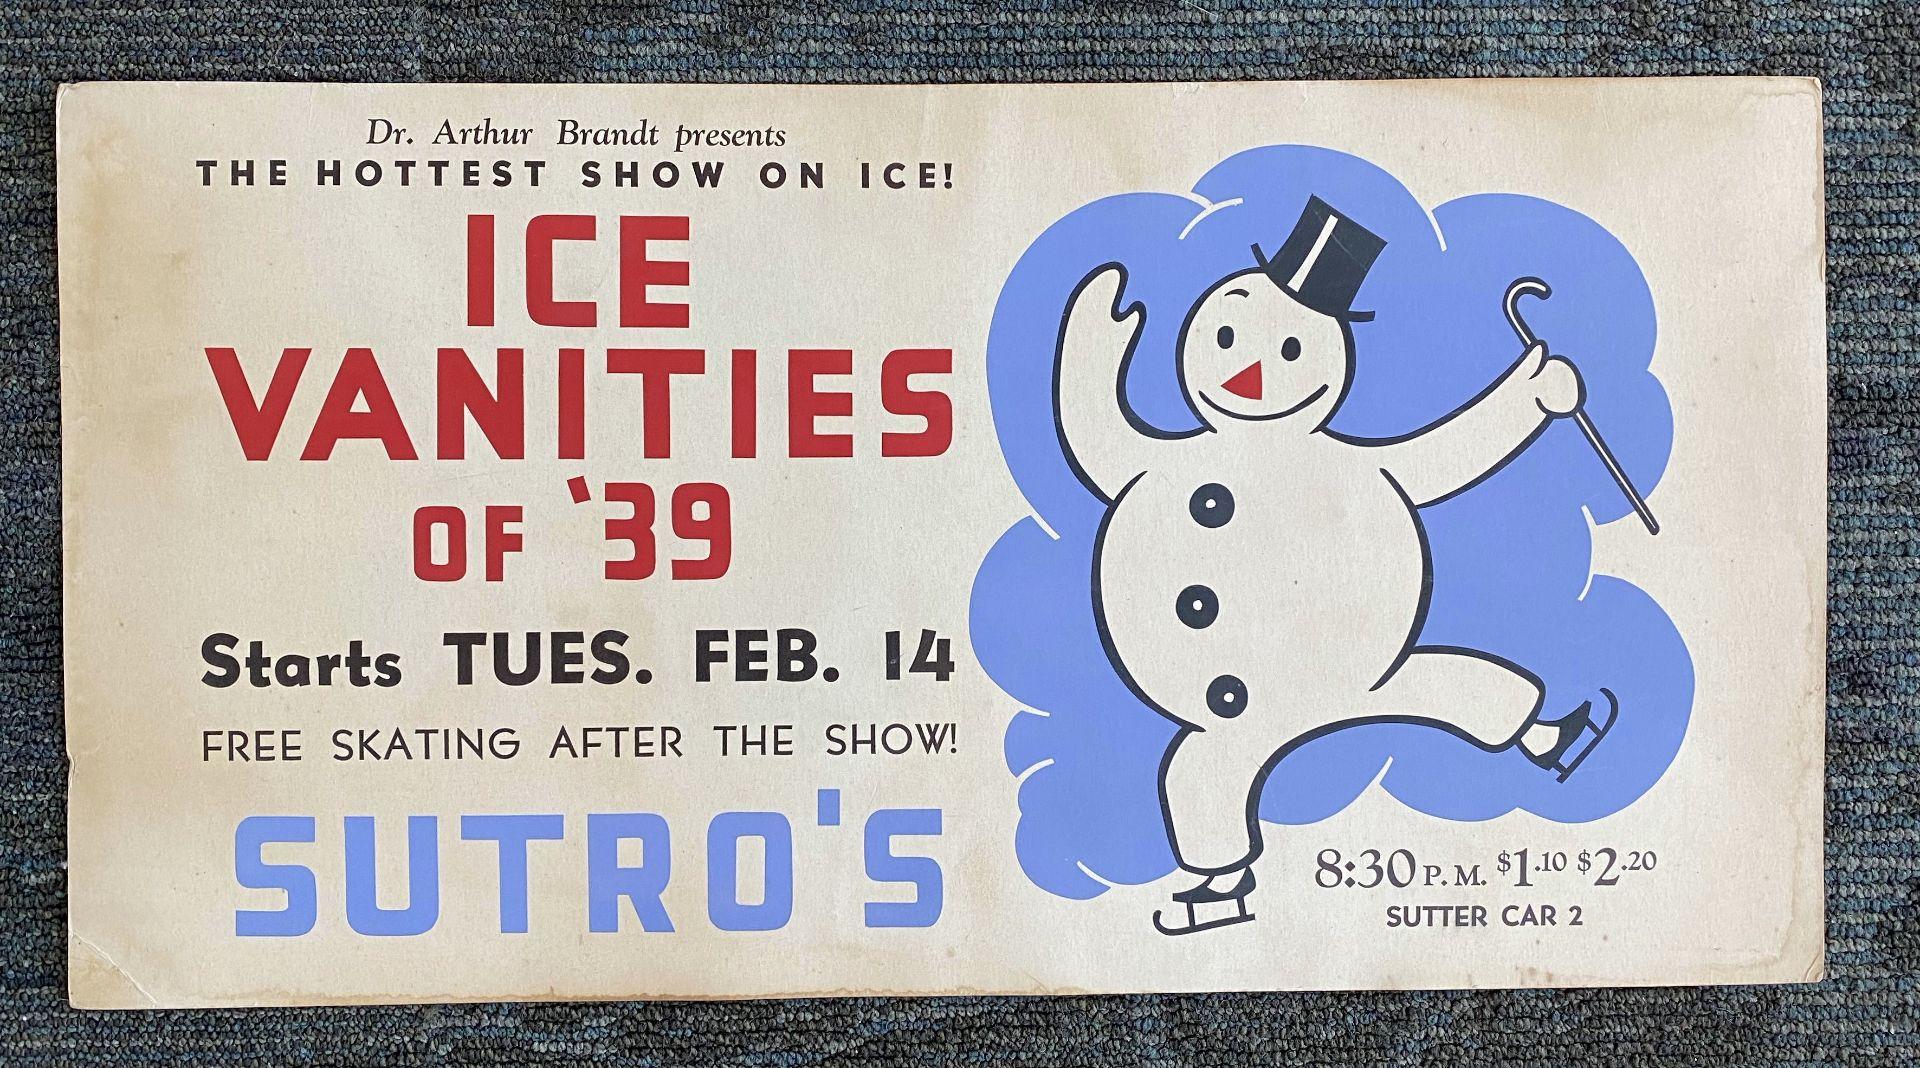 Poster - Sutros Ice Skating - Ice Vanities (Snow Man)